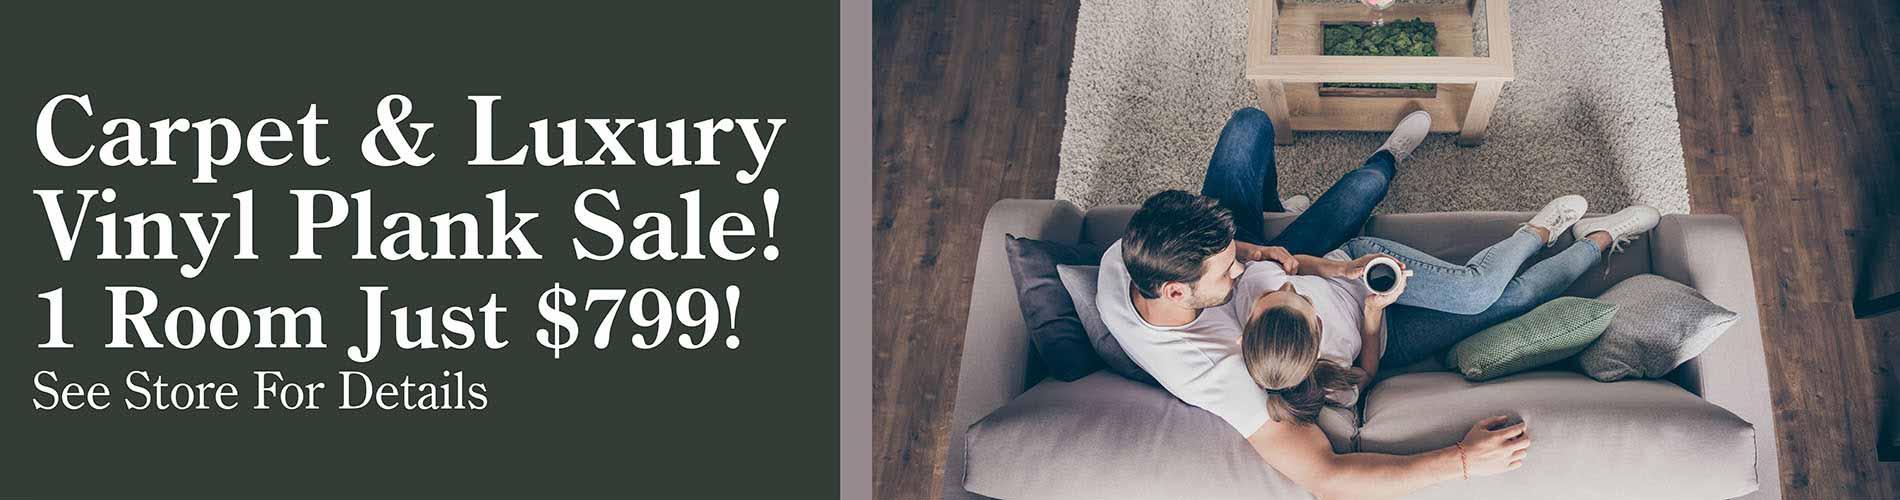 Carpet & Luxury Vinyl Plank on sale at Finishing Touch Design Studio